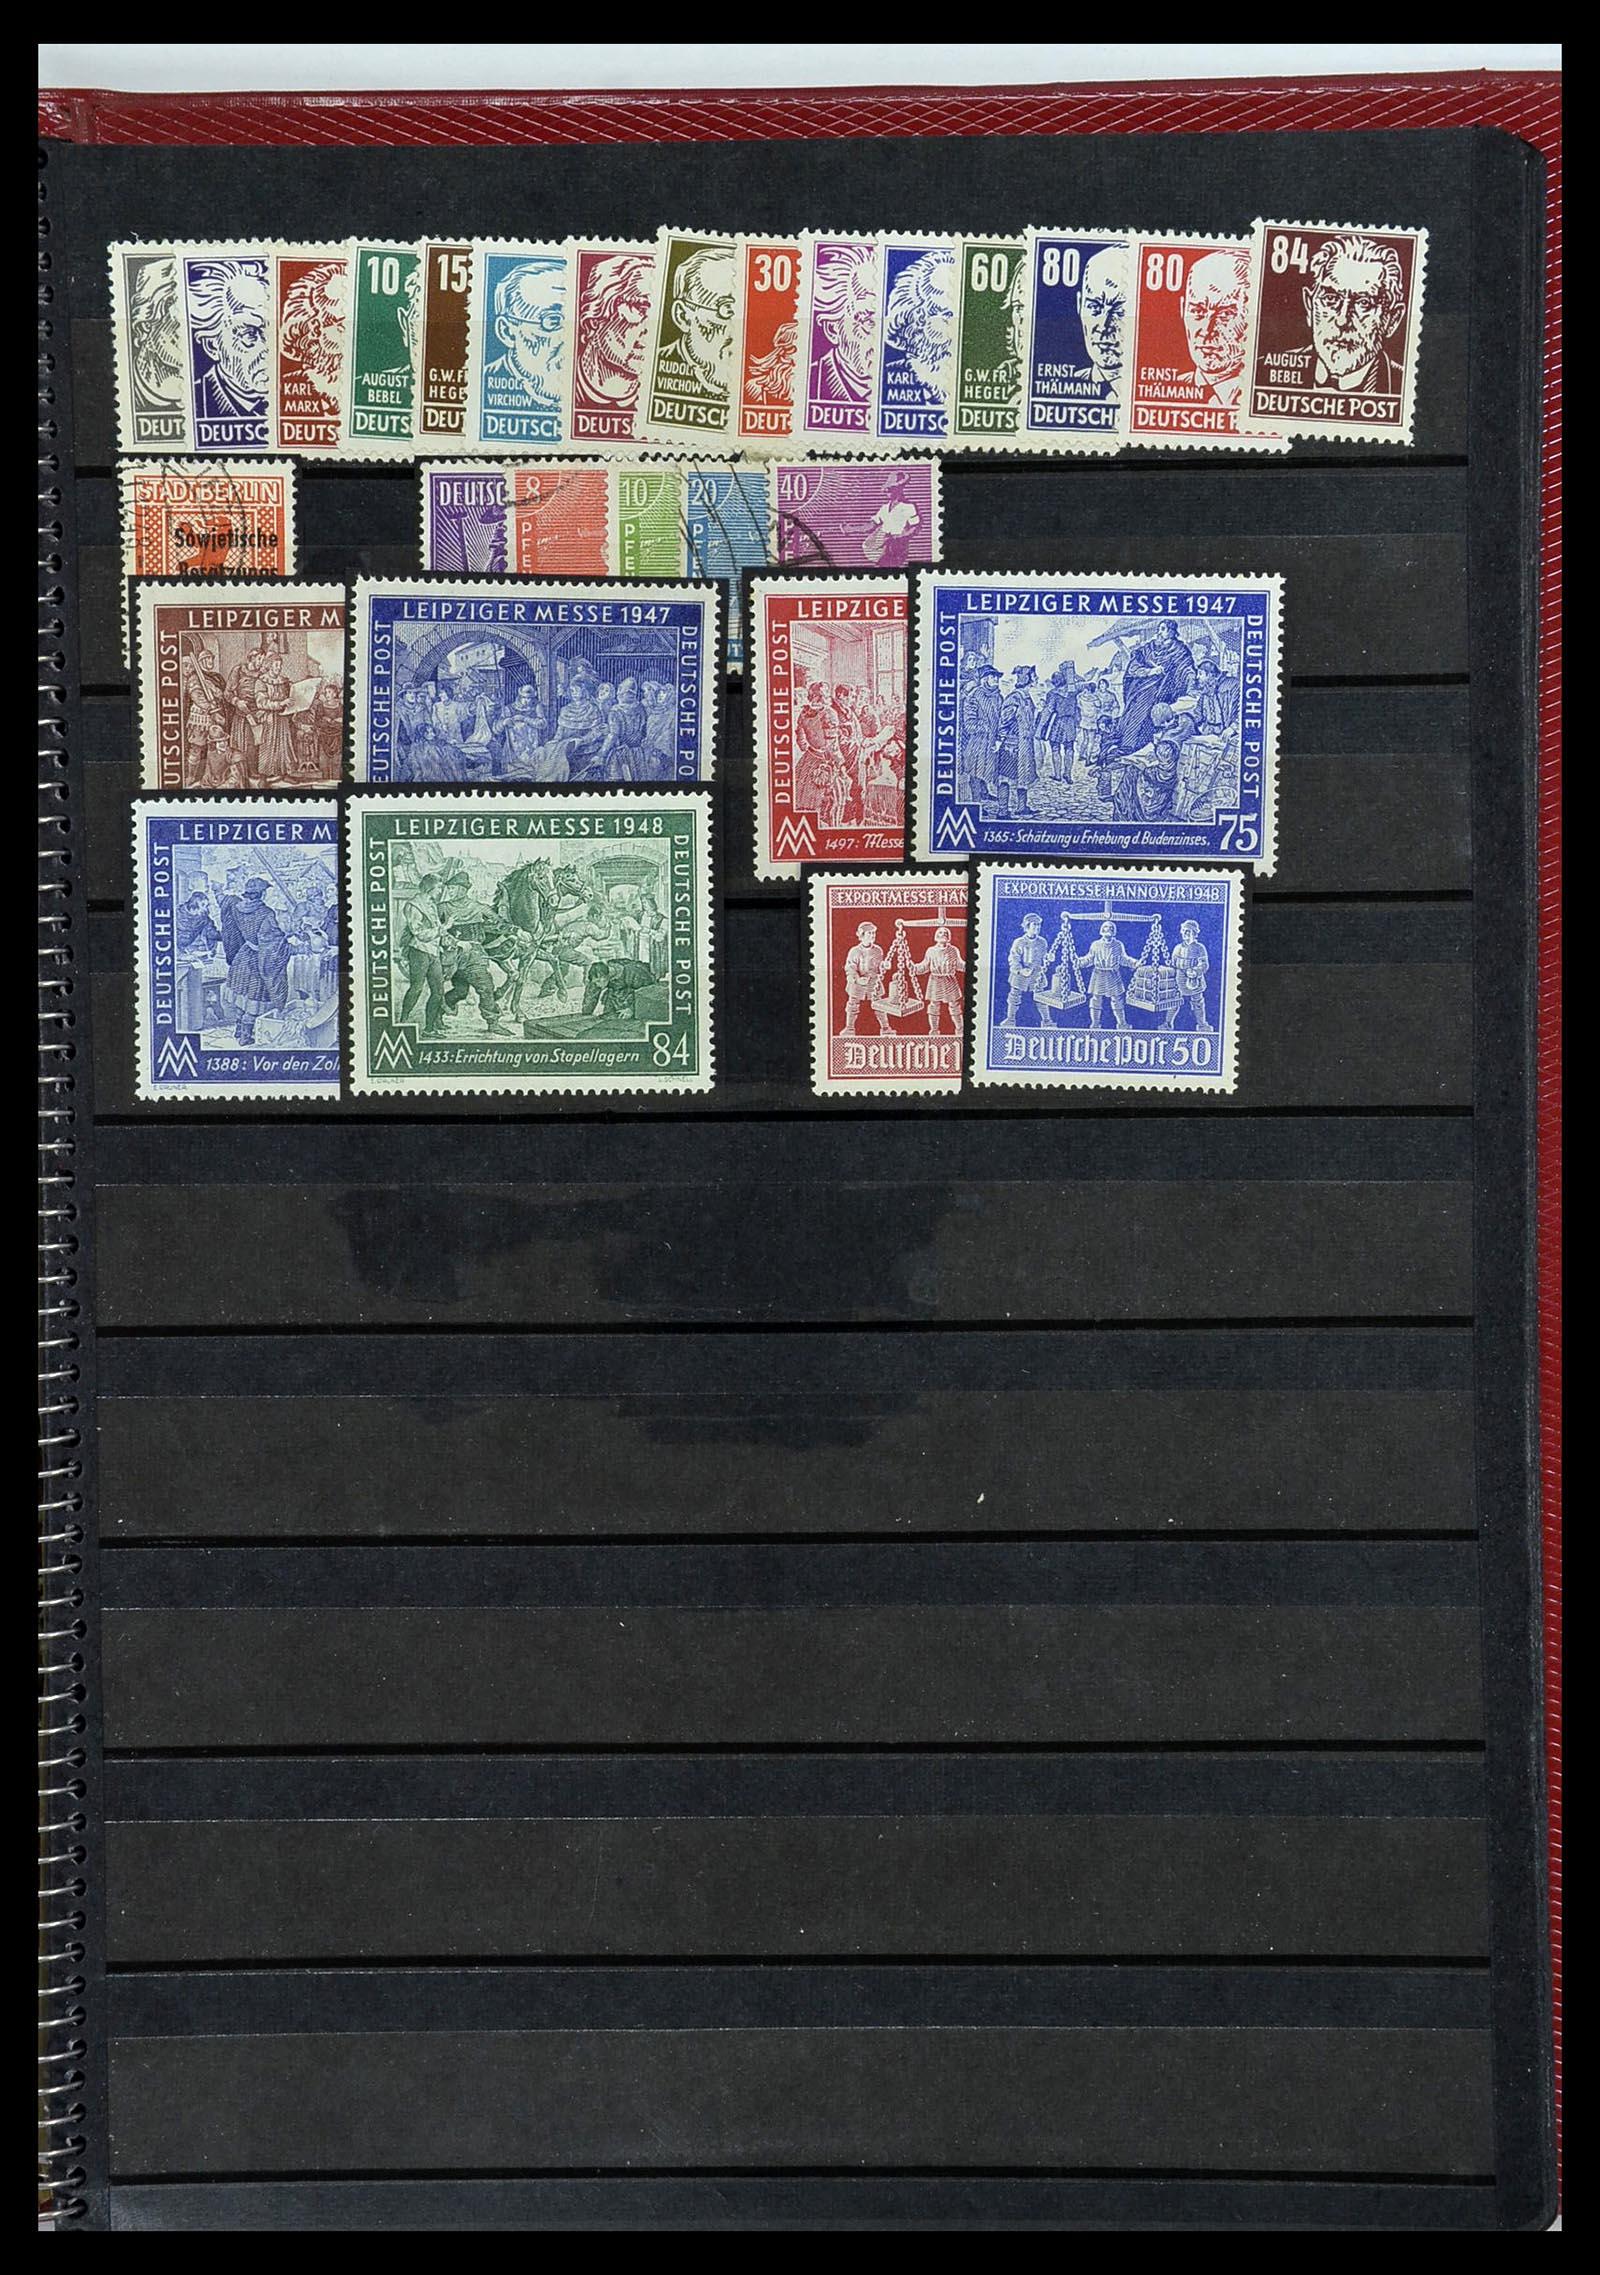 34169 005 - Postzegelverzameling 34169 Duitsland 1880-1955.